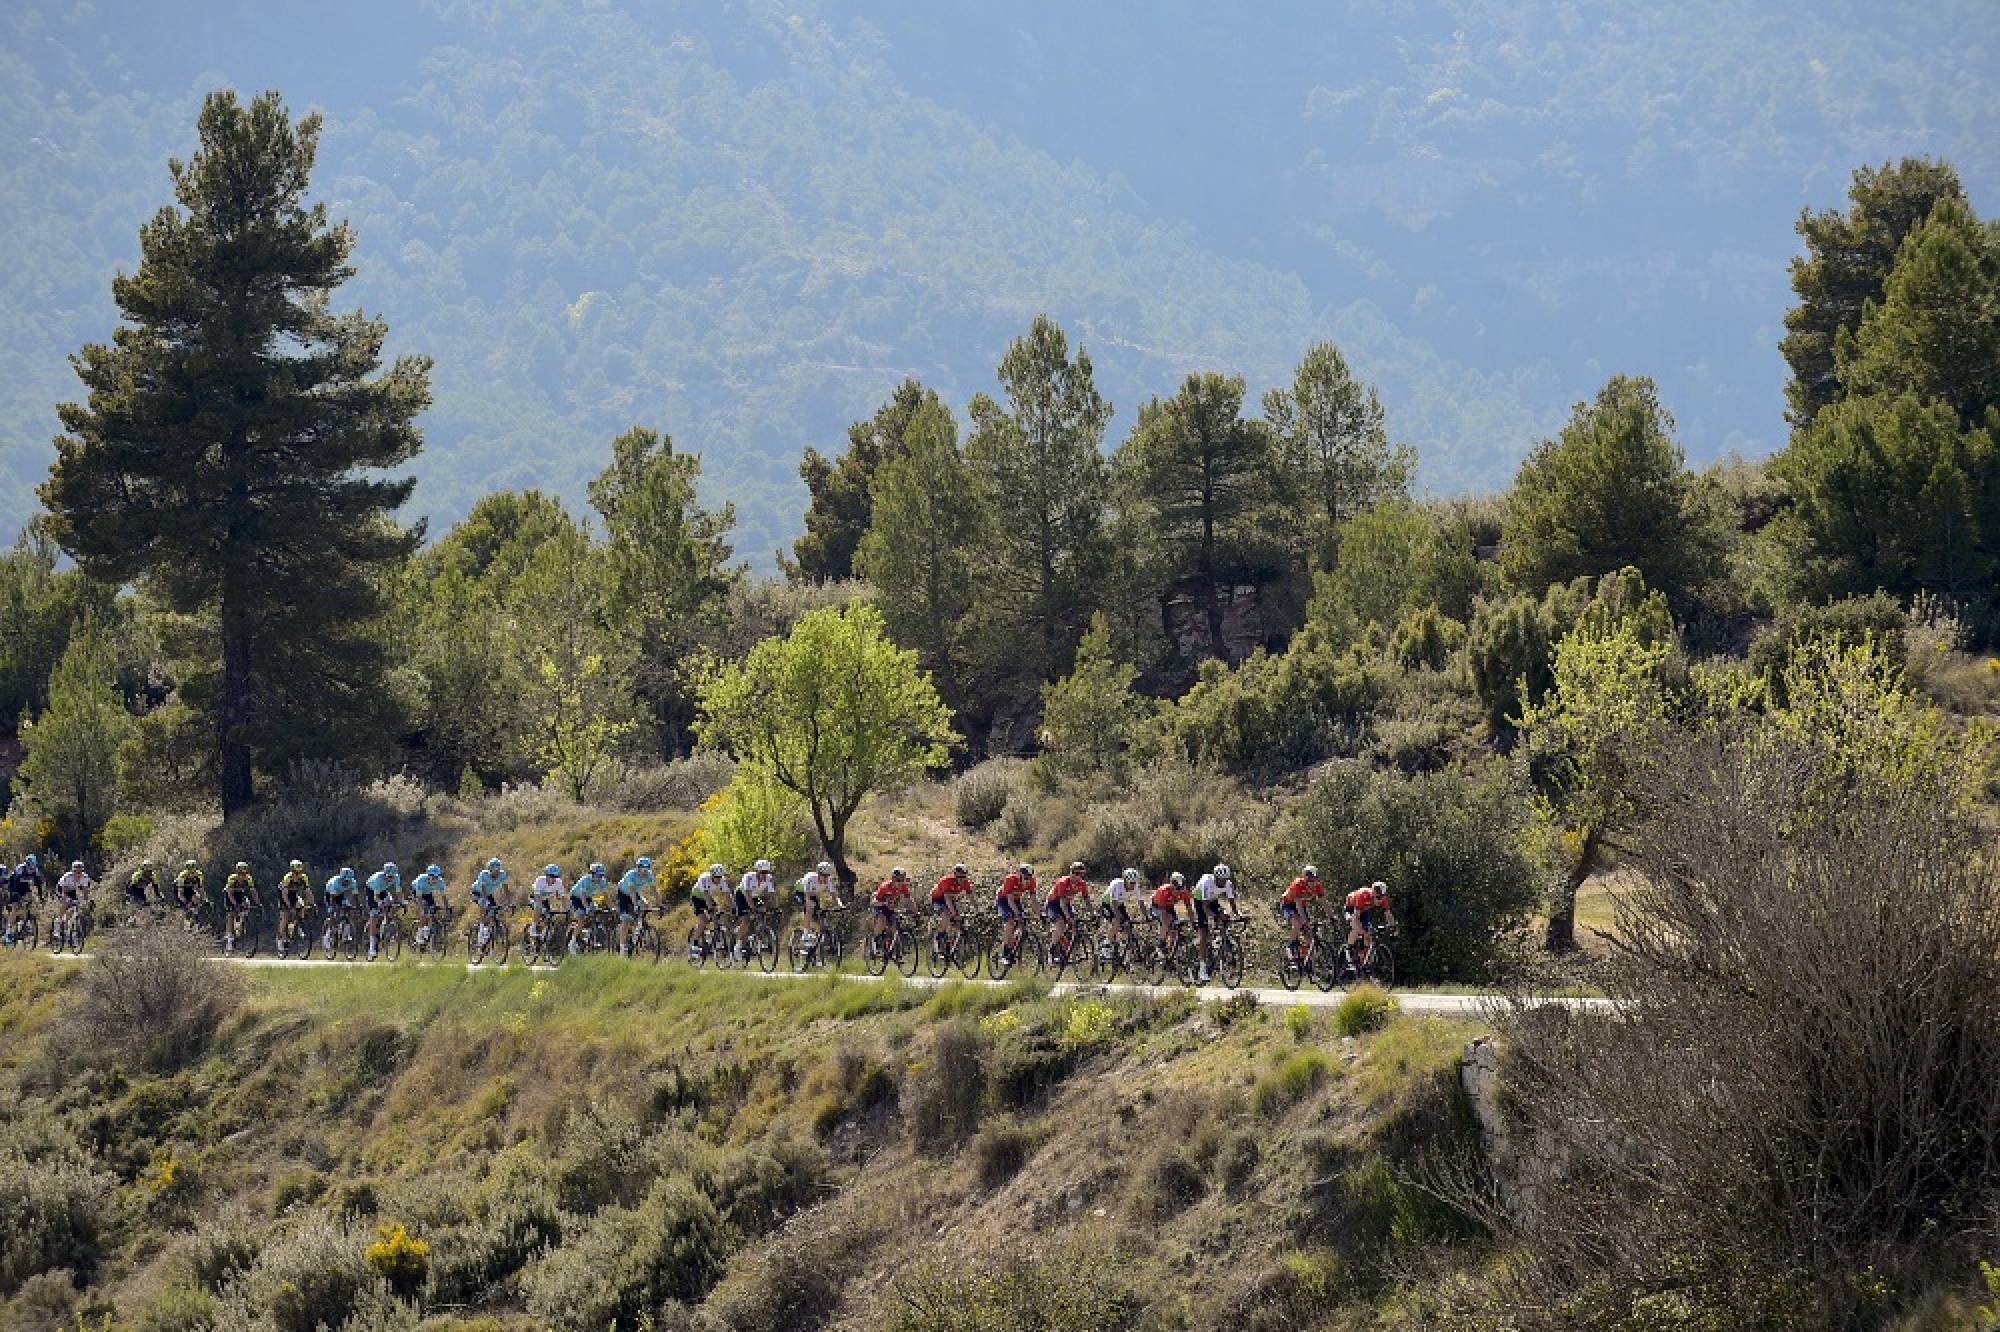 Sexta etapa de la Volta de Catalunya disputada entre Valls y Vila-seca  ganada por el ciclista Australiano Michael Mattews